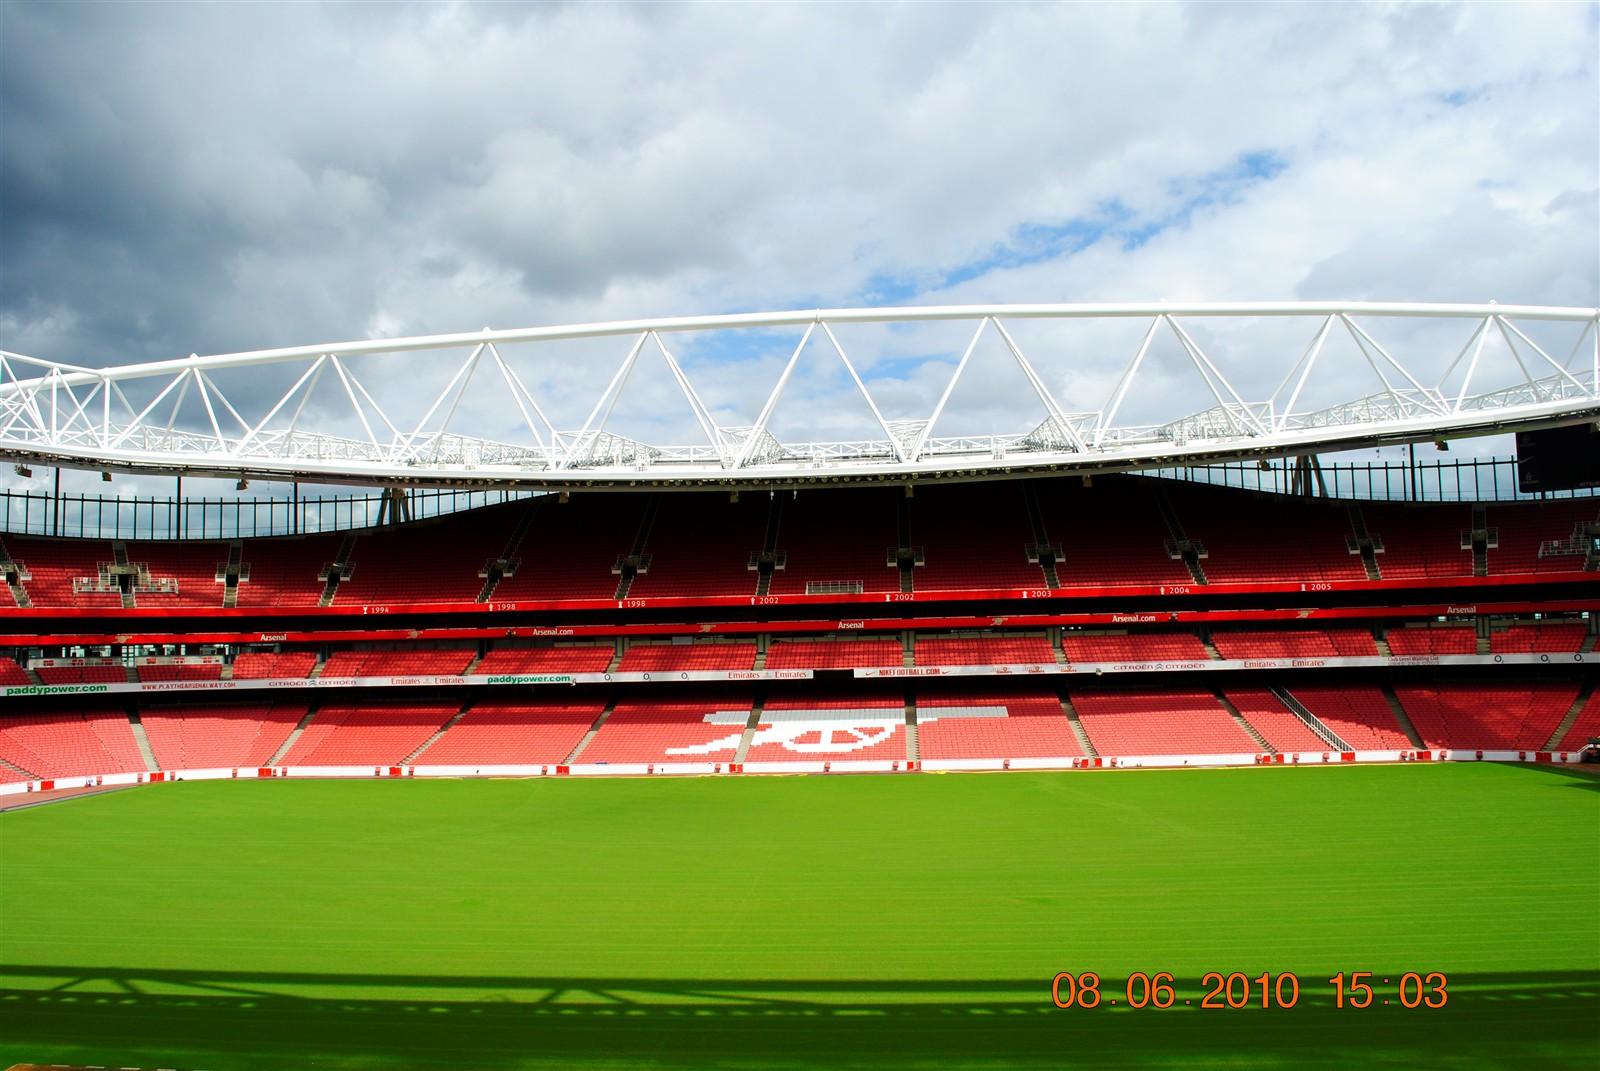 Hd wallpaper lg g6 - Emirates Stadium Arsenal F C Przemek S Keita Galleries